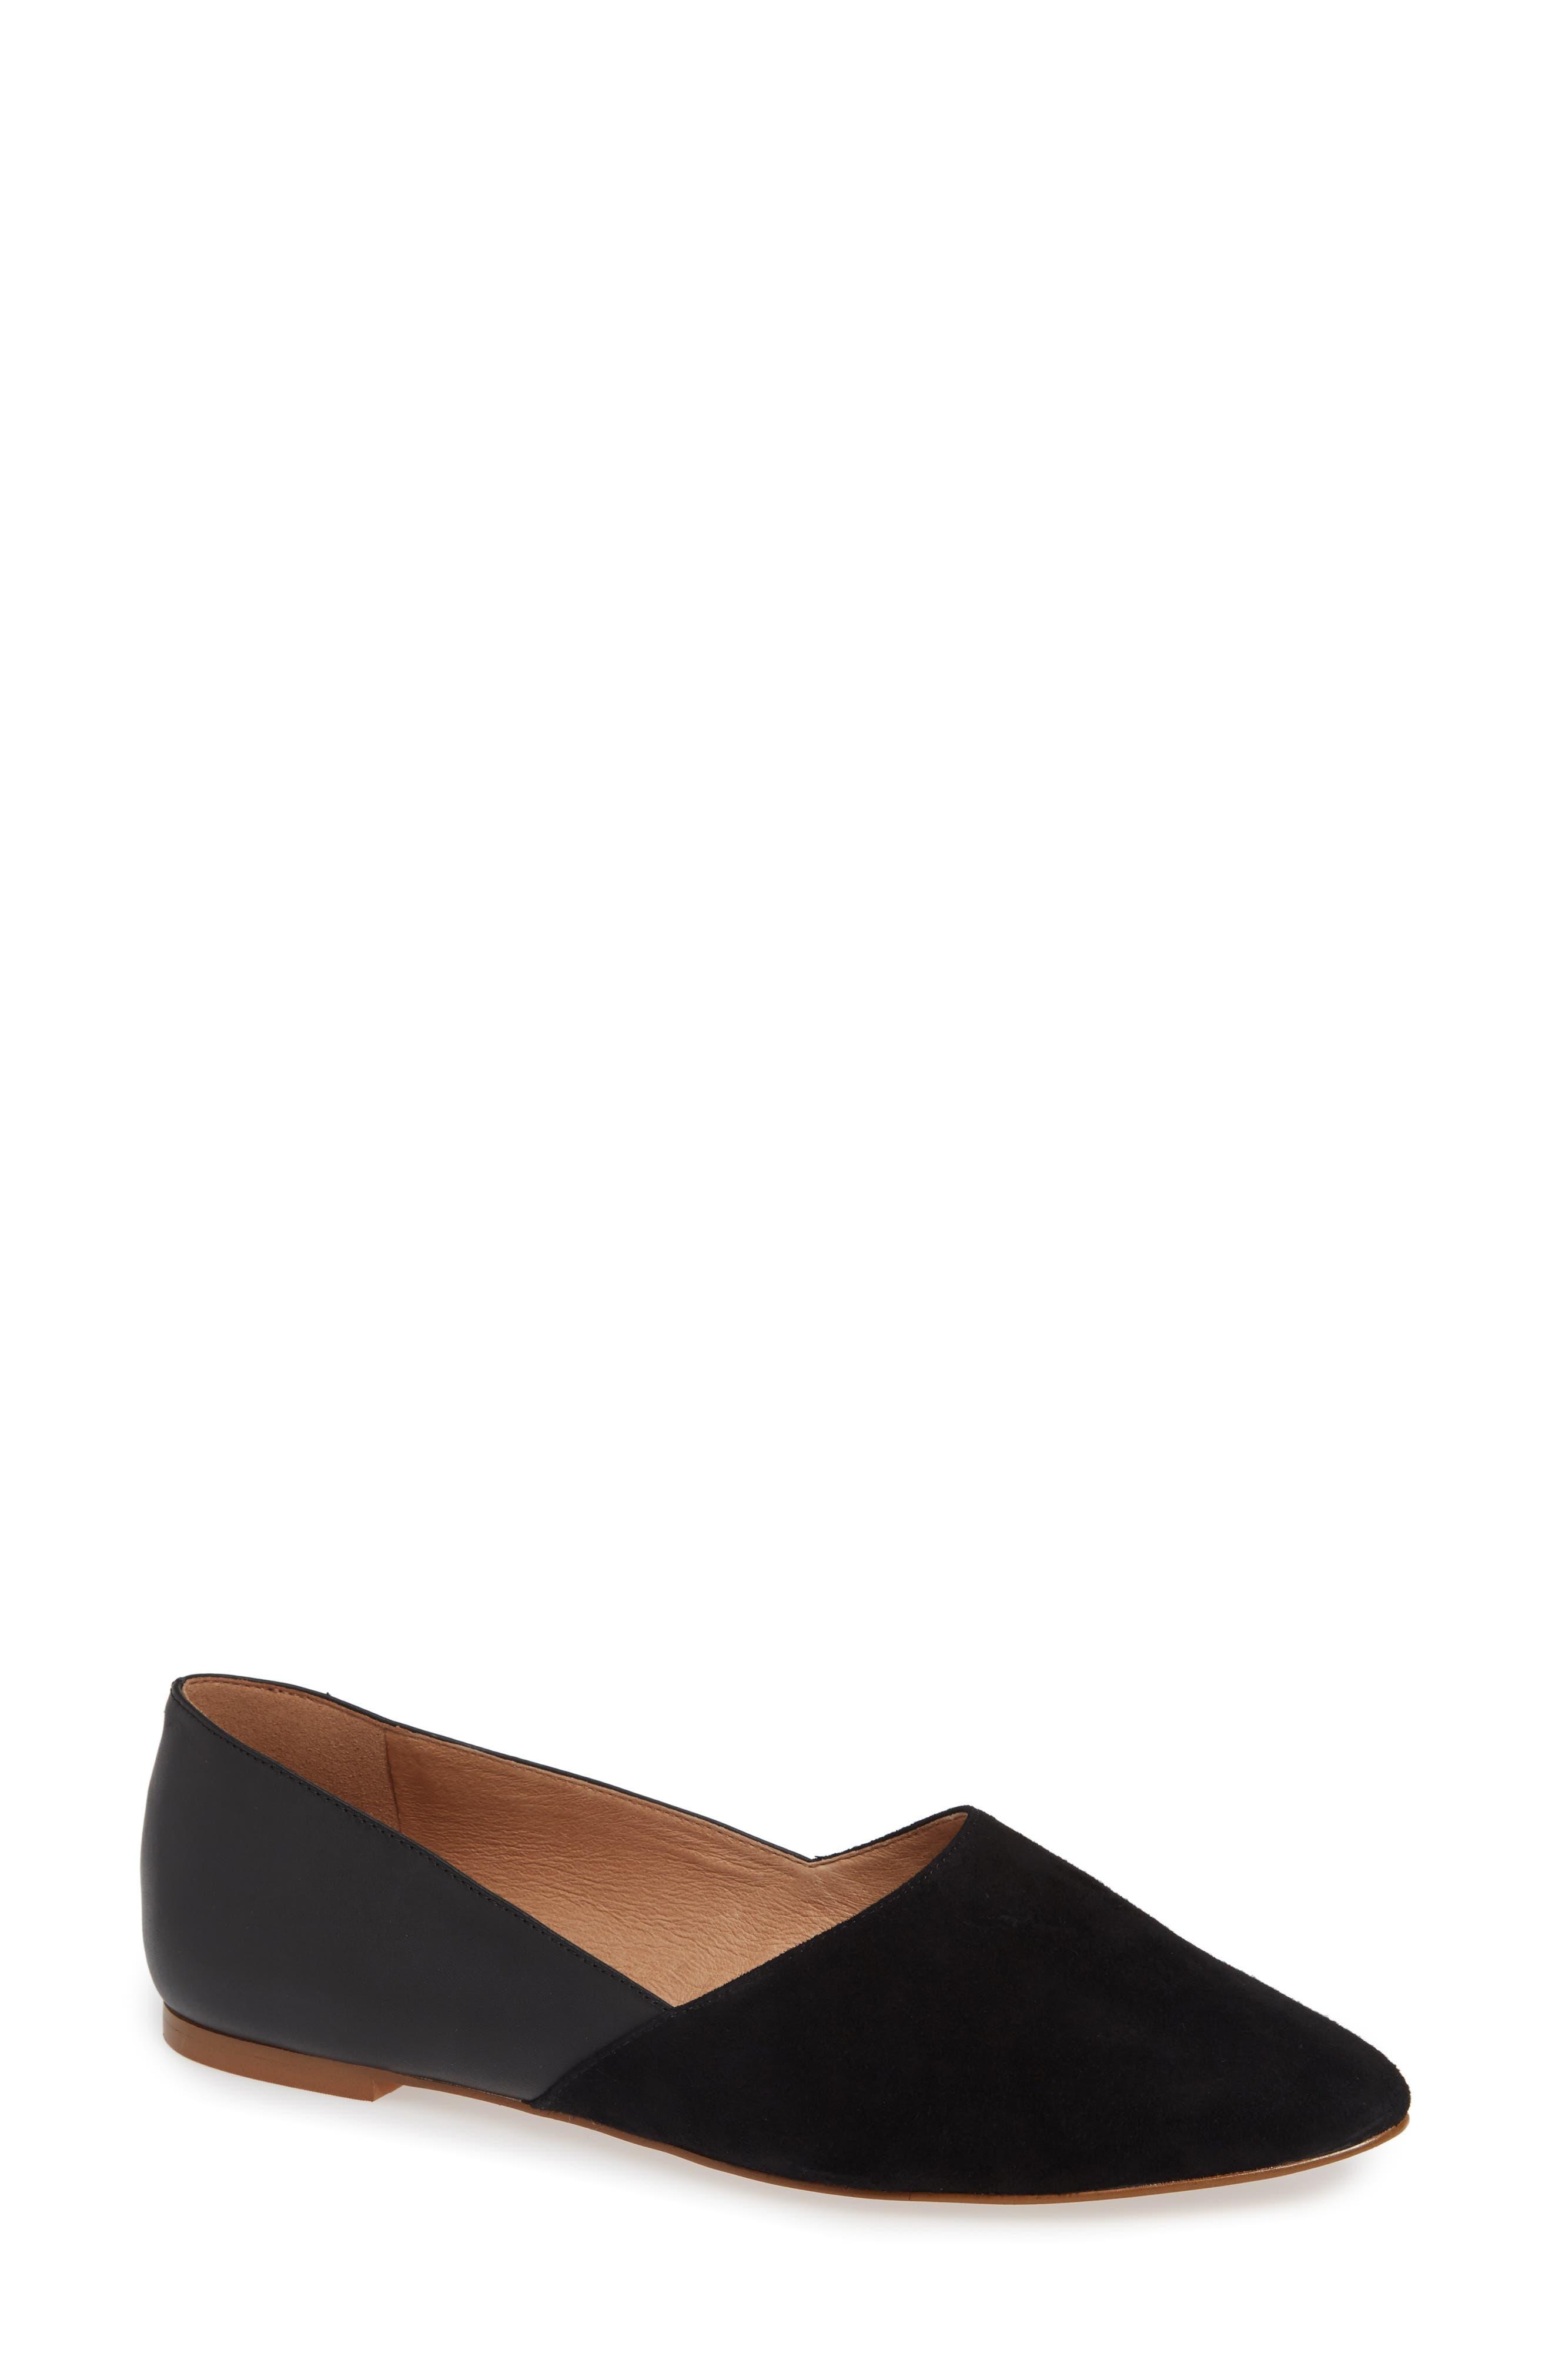 Lizbeth Pointy Toe Flat, Main, color, 001